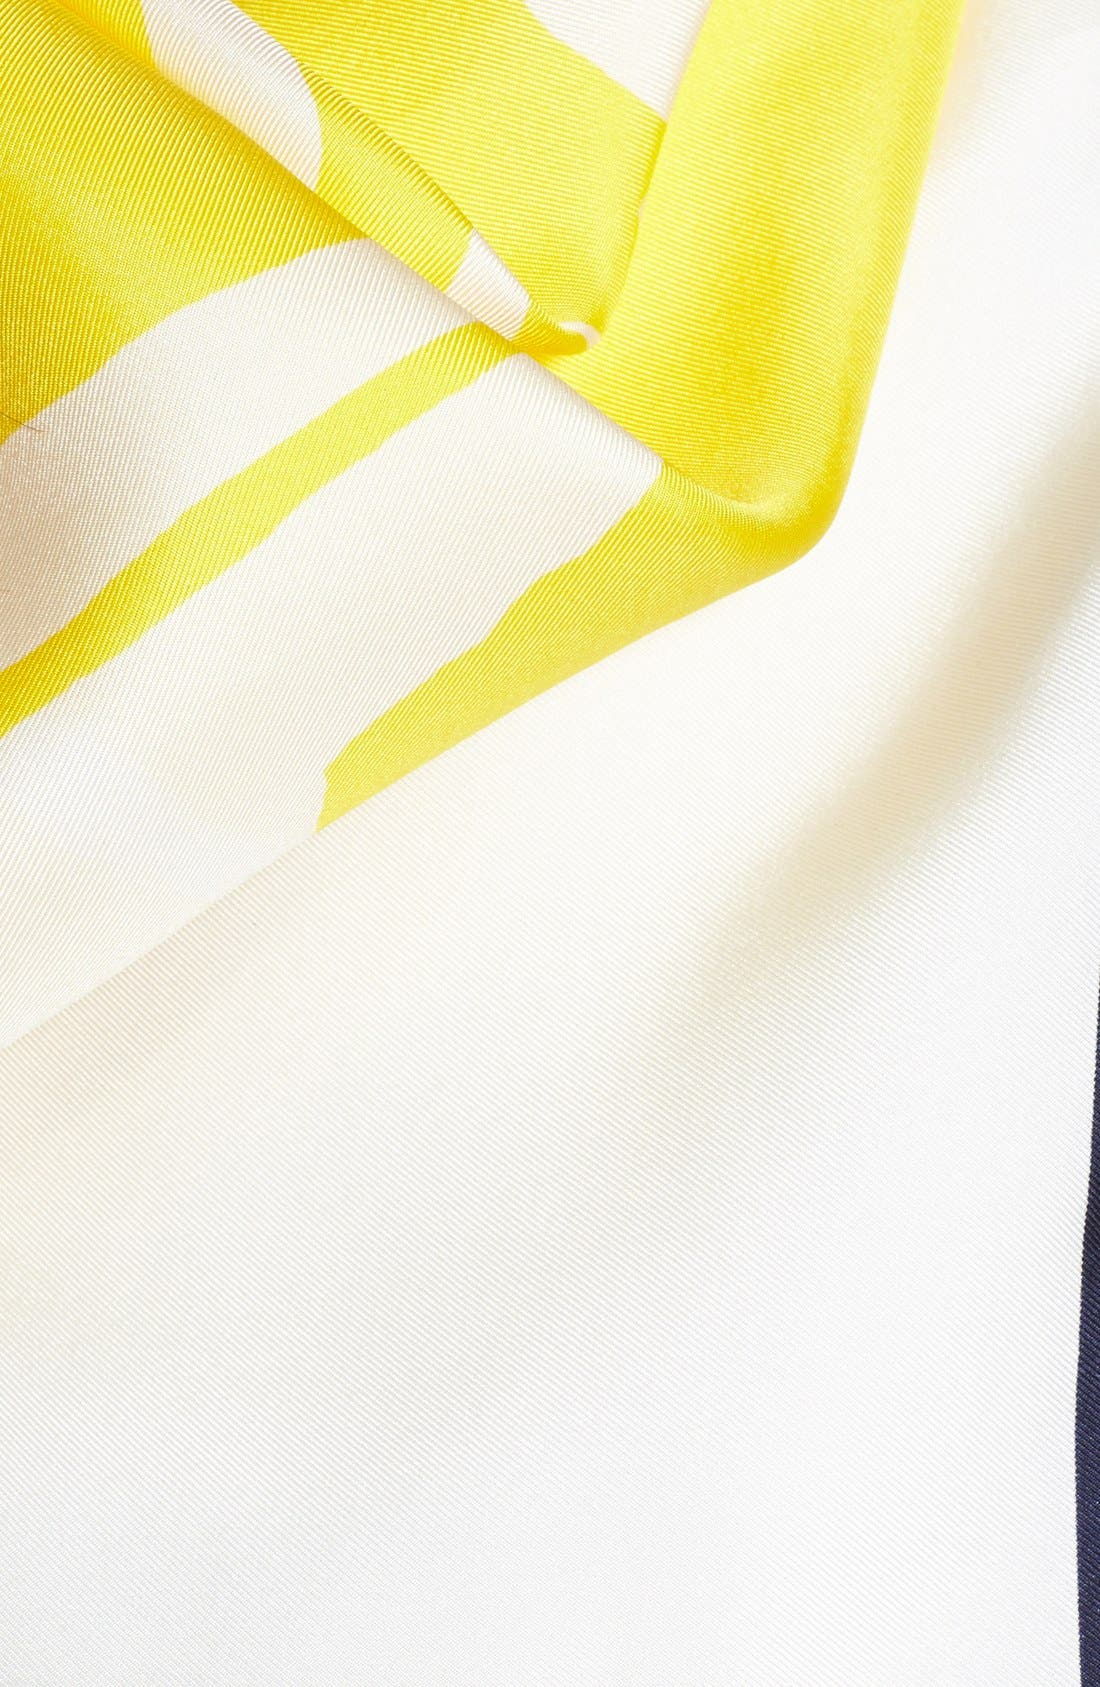 Alternate Image 3  - kate spade new york 'lemon slice' silk scarf